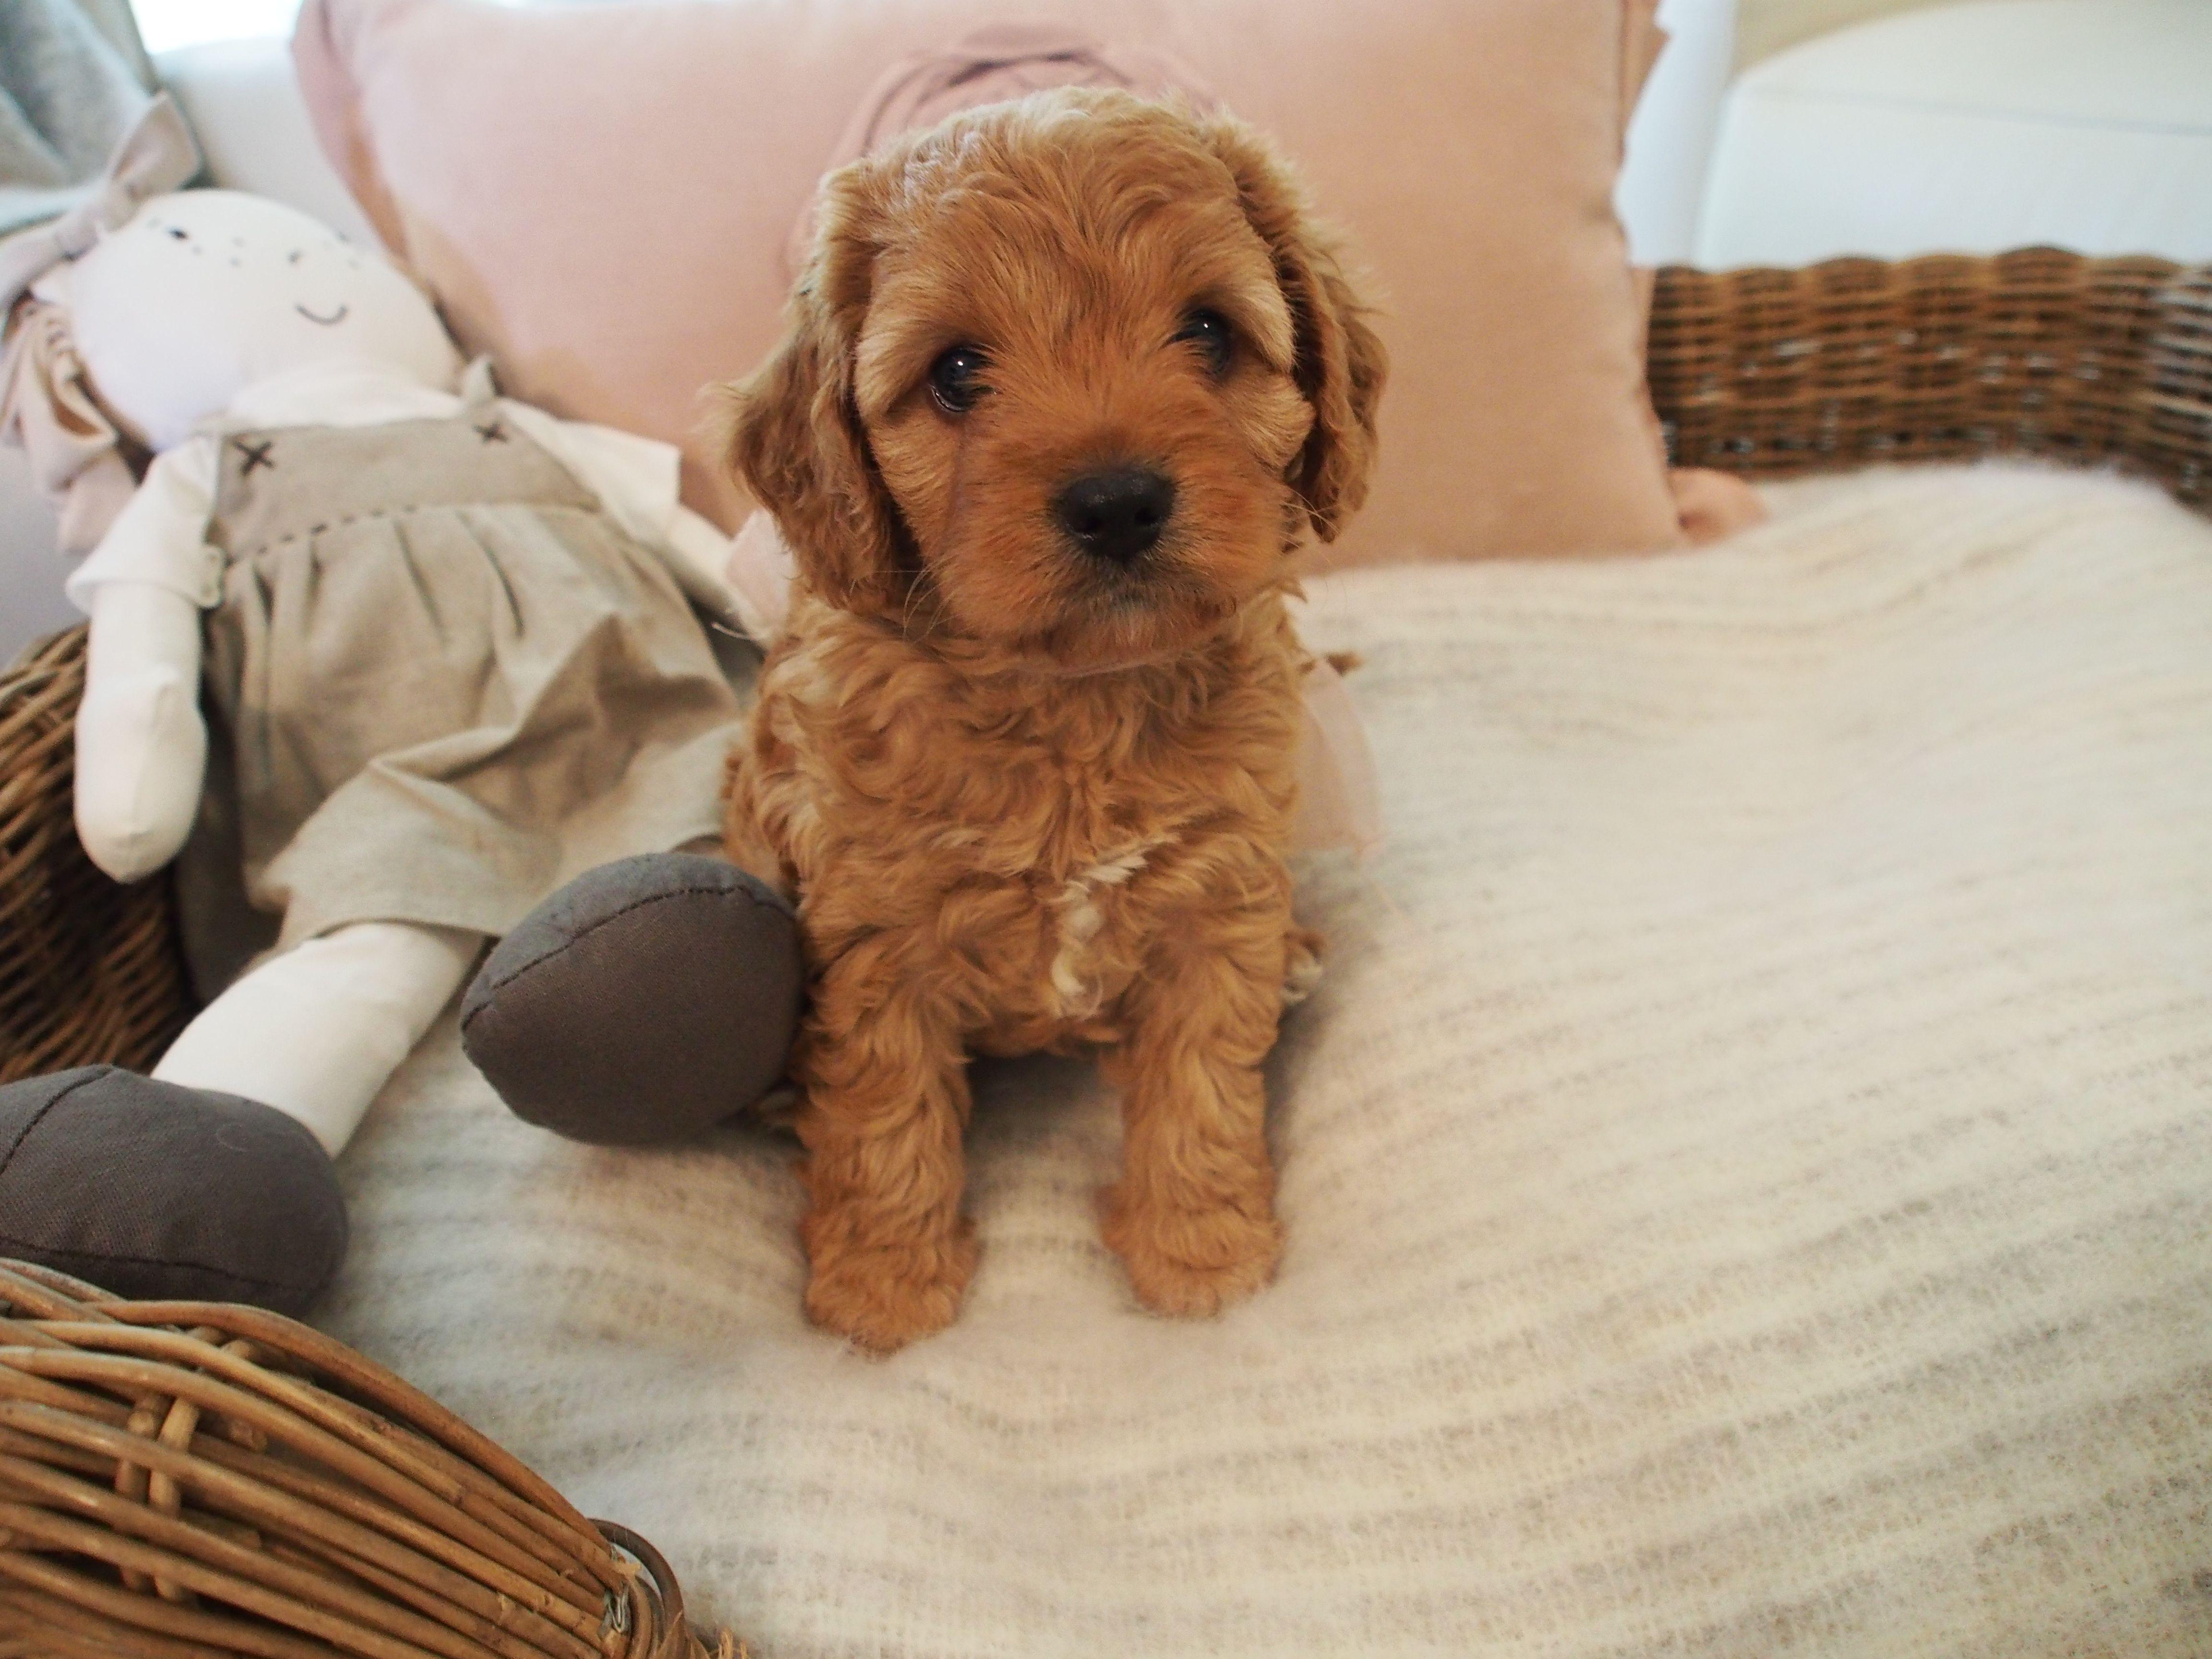 Pin By 𝒄𝒉𝒍𝒐𝒆 𝒔𝒂𝒍𝒗𝒂 On ᴄᴏᴍᴘᴀɴɪᴏɴs Dogs Puppies Collie